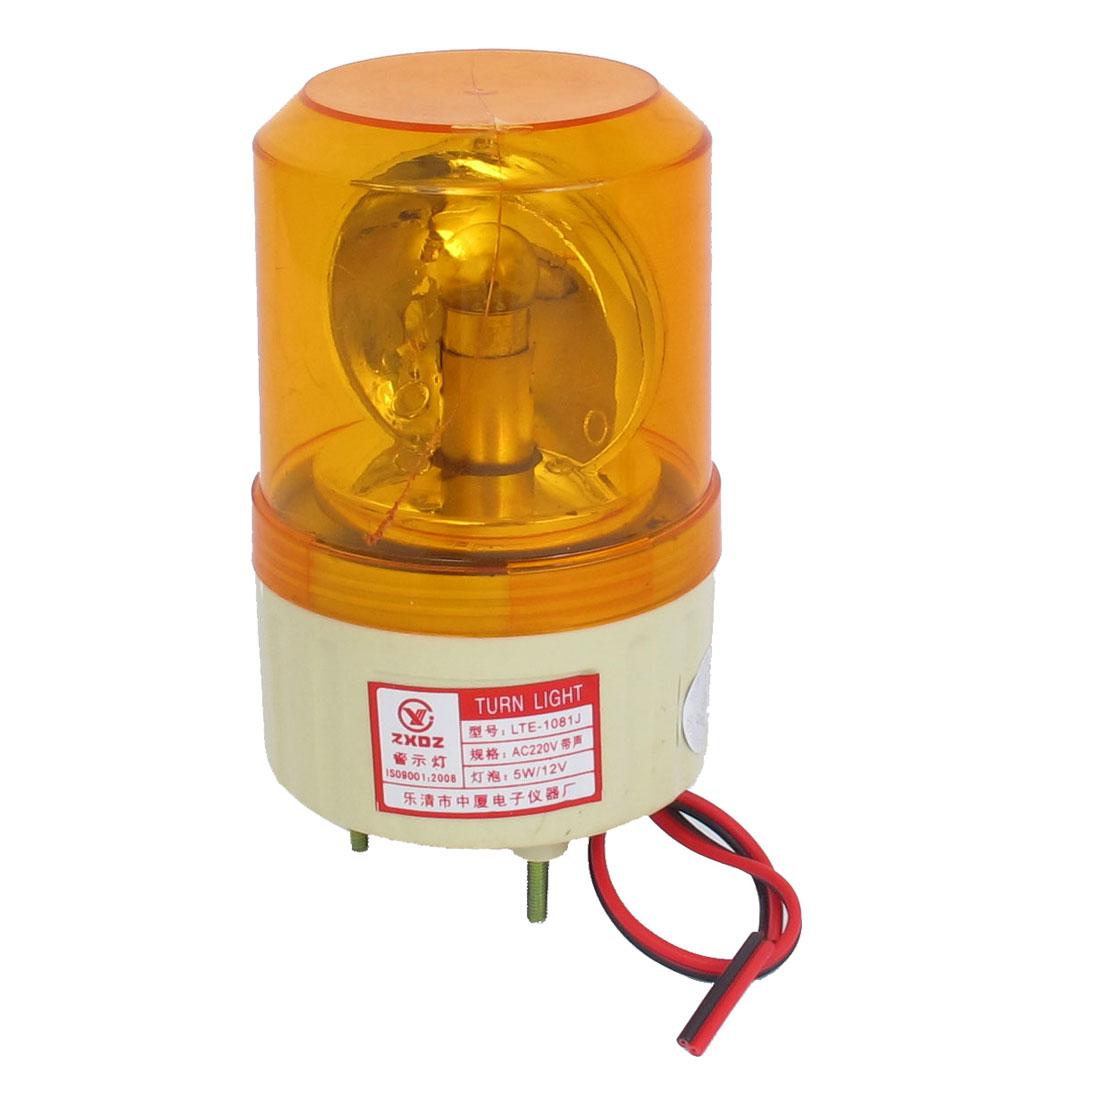 AC 220V Buzzer Sound Rotating Industrial Signal Warning Lamp Orange